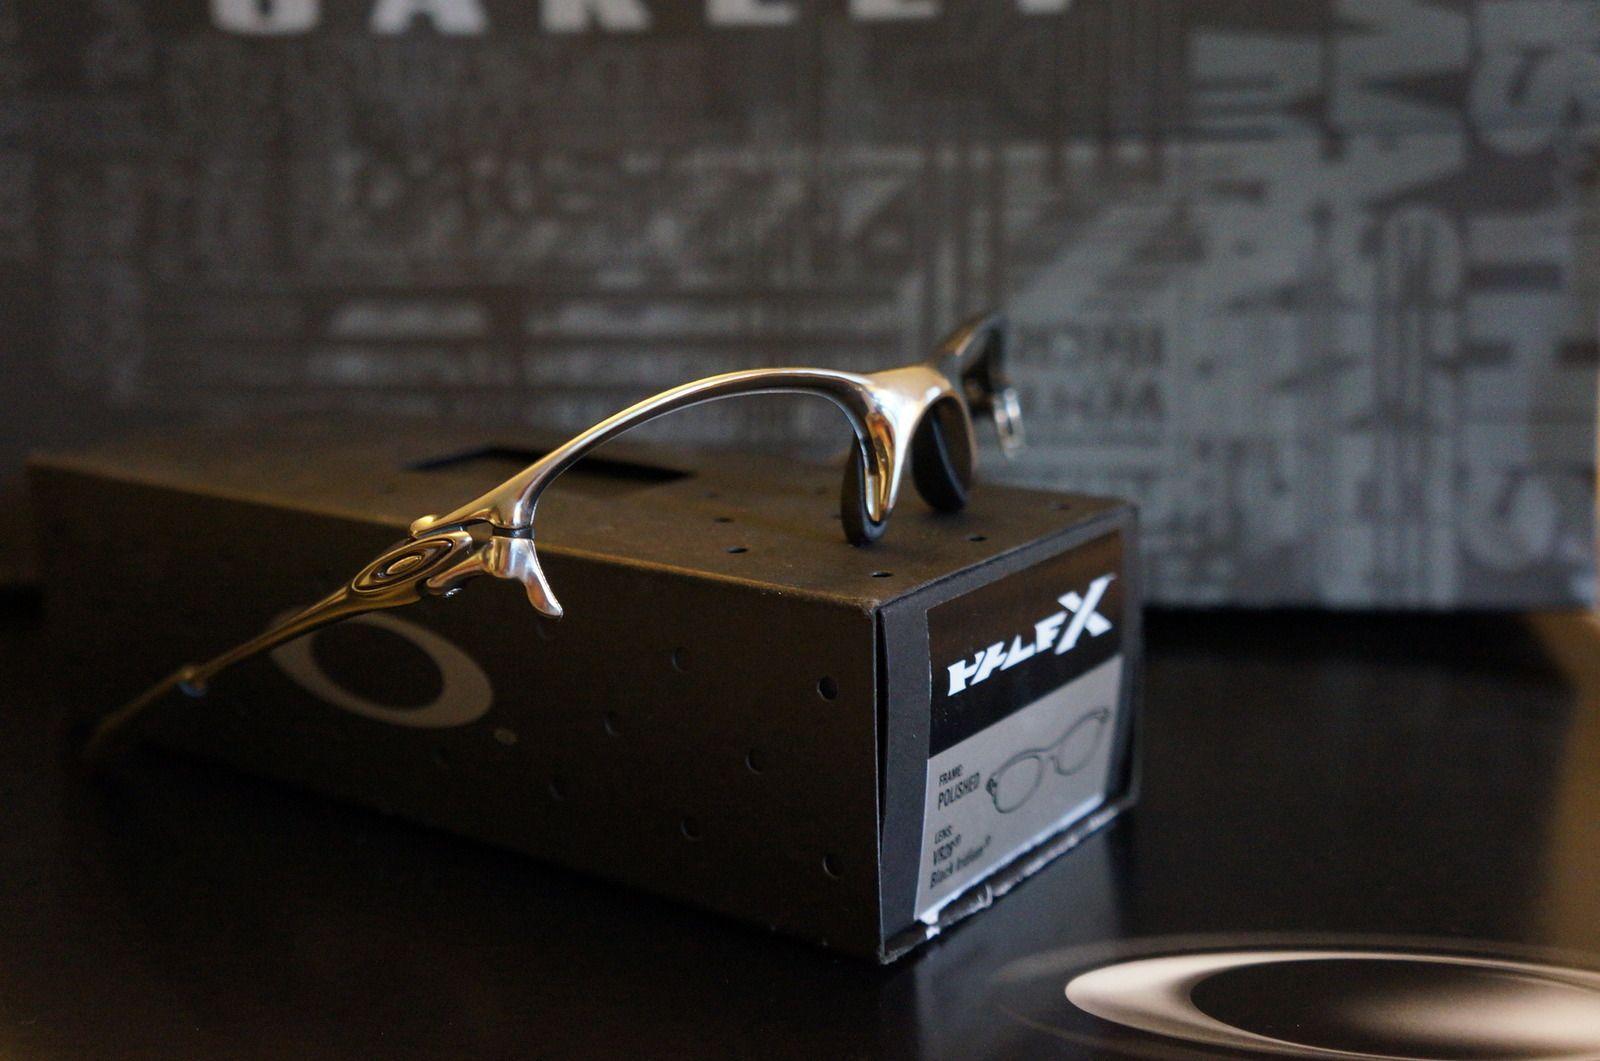 Polished Half-X Frame/Coin/Original Box - No Lens - dsc06513h.jpg